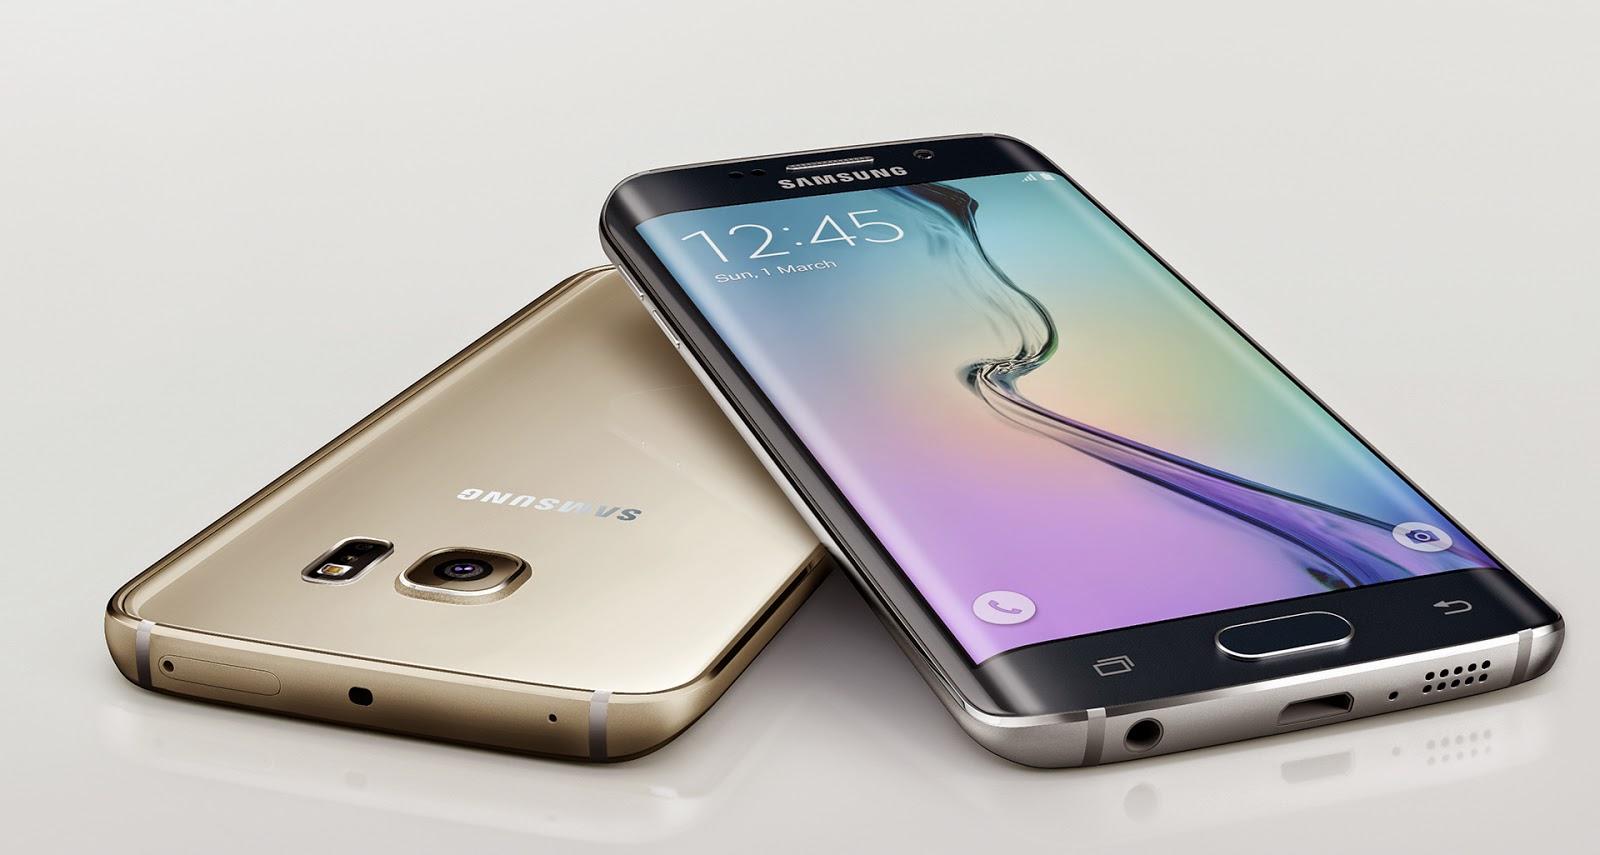 Spesifikasi dan Harga Samsung Galaxy S6 edge di Indonesia